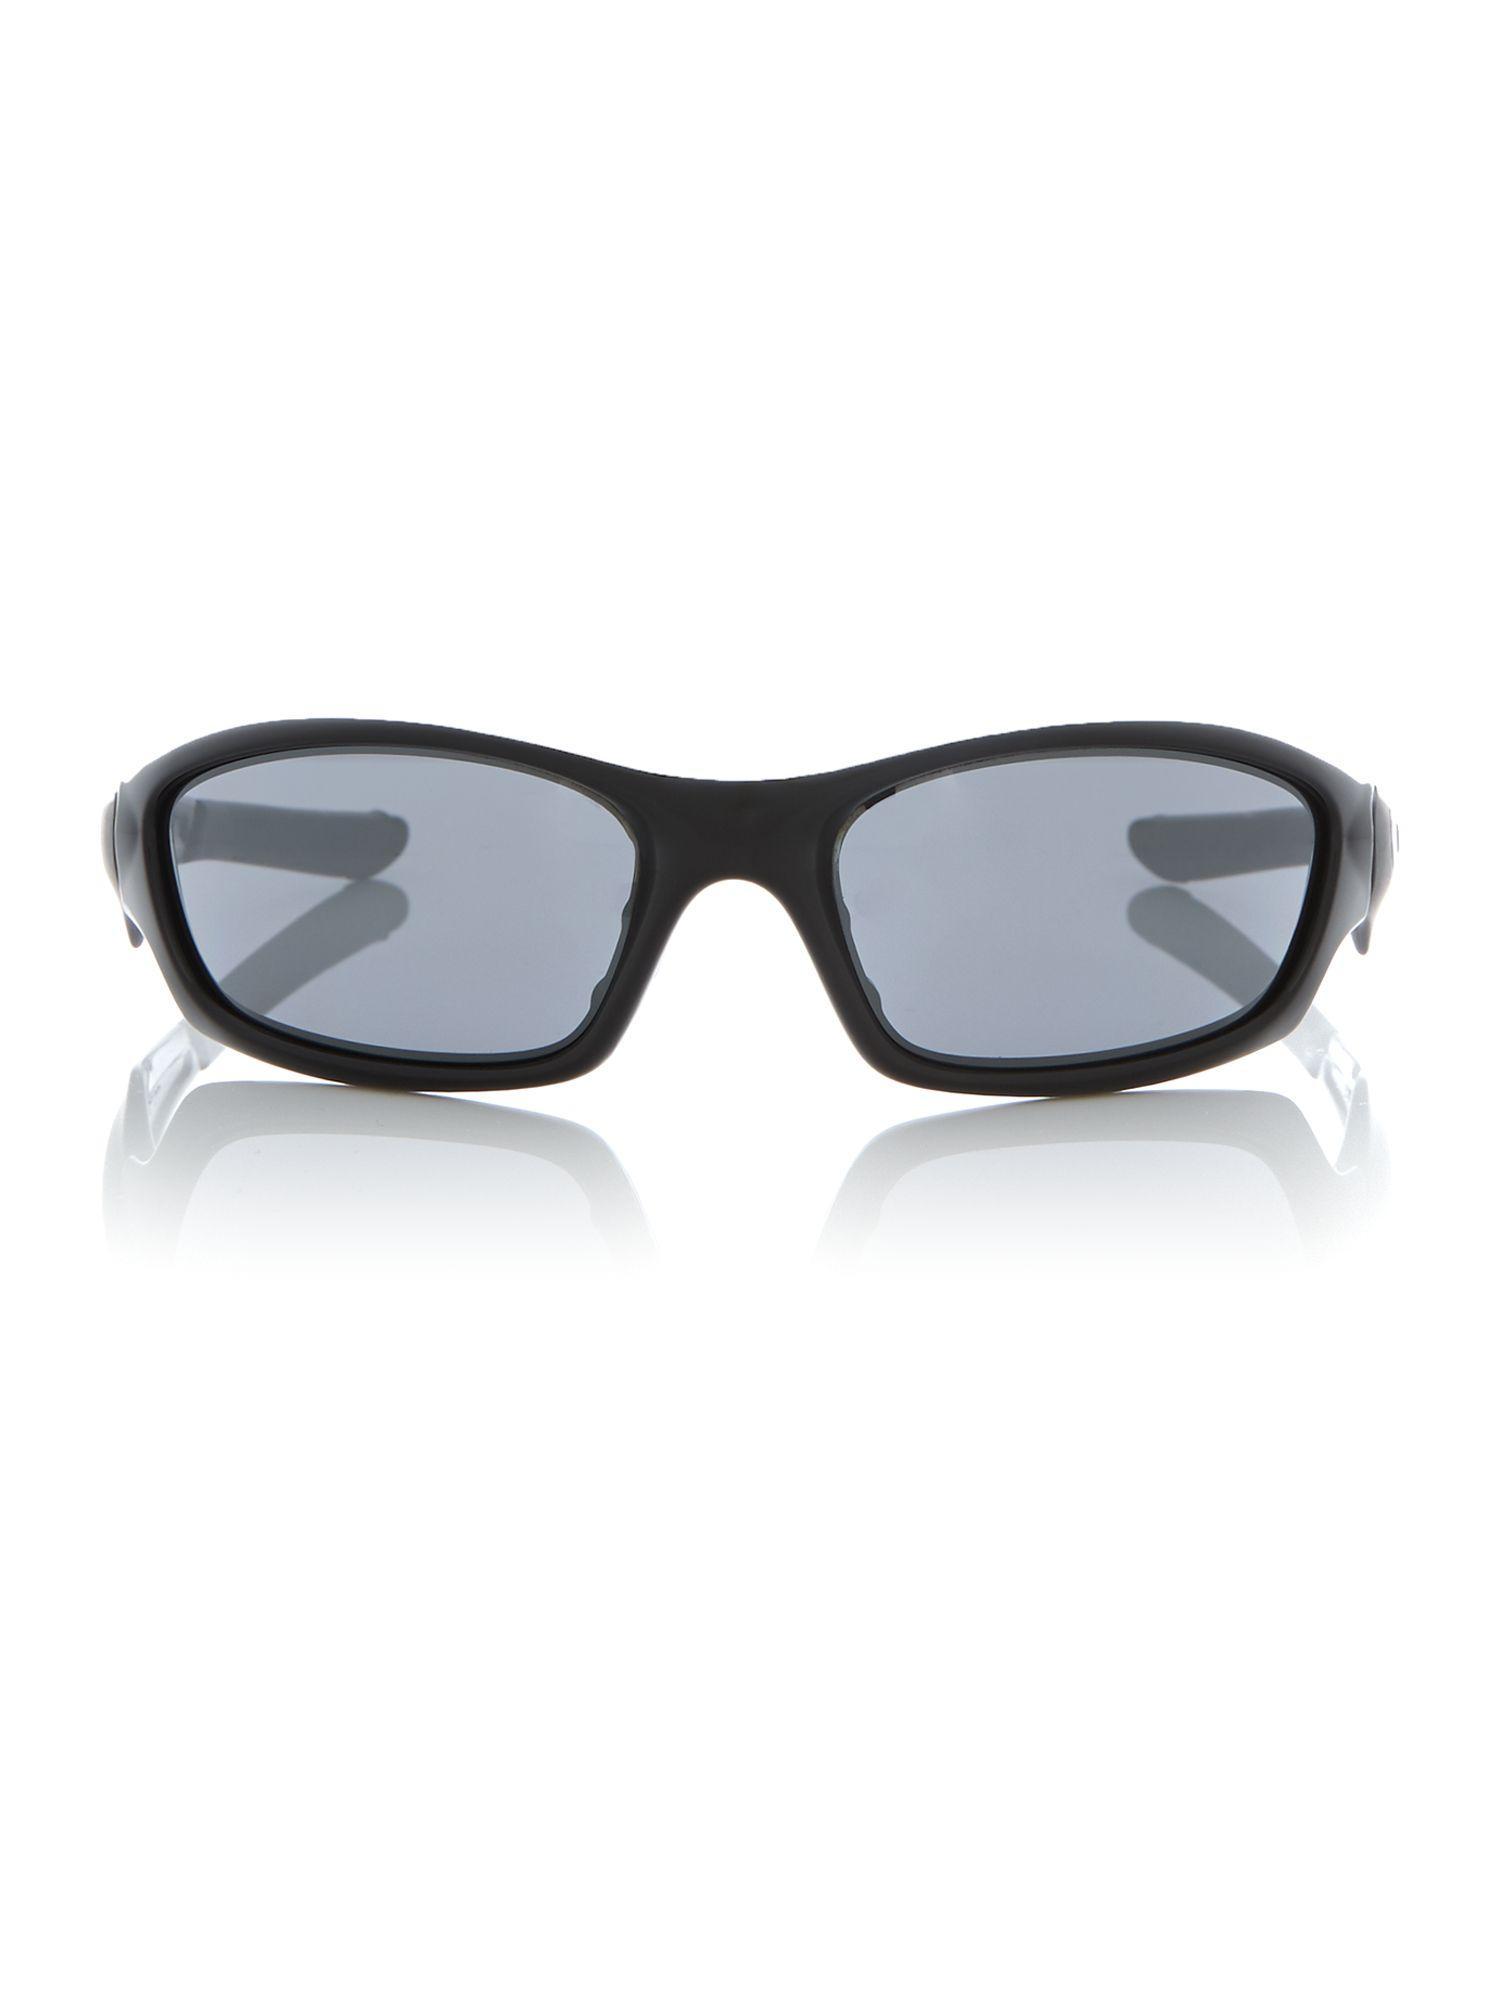 76a86acbec Oakley Batwolf Rectangular Sunglasses